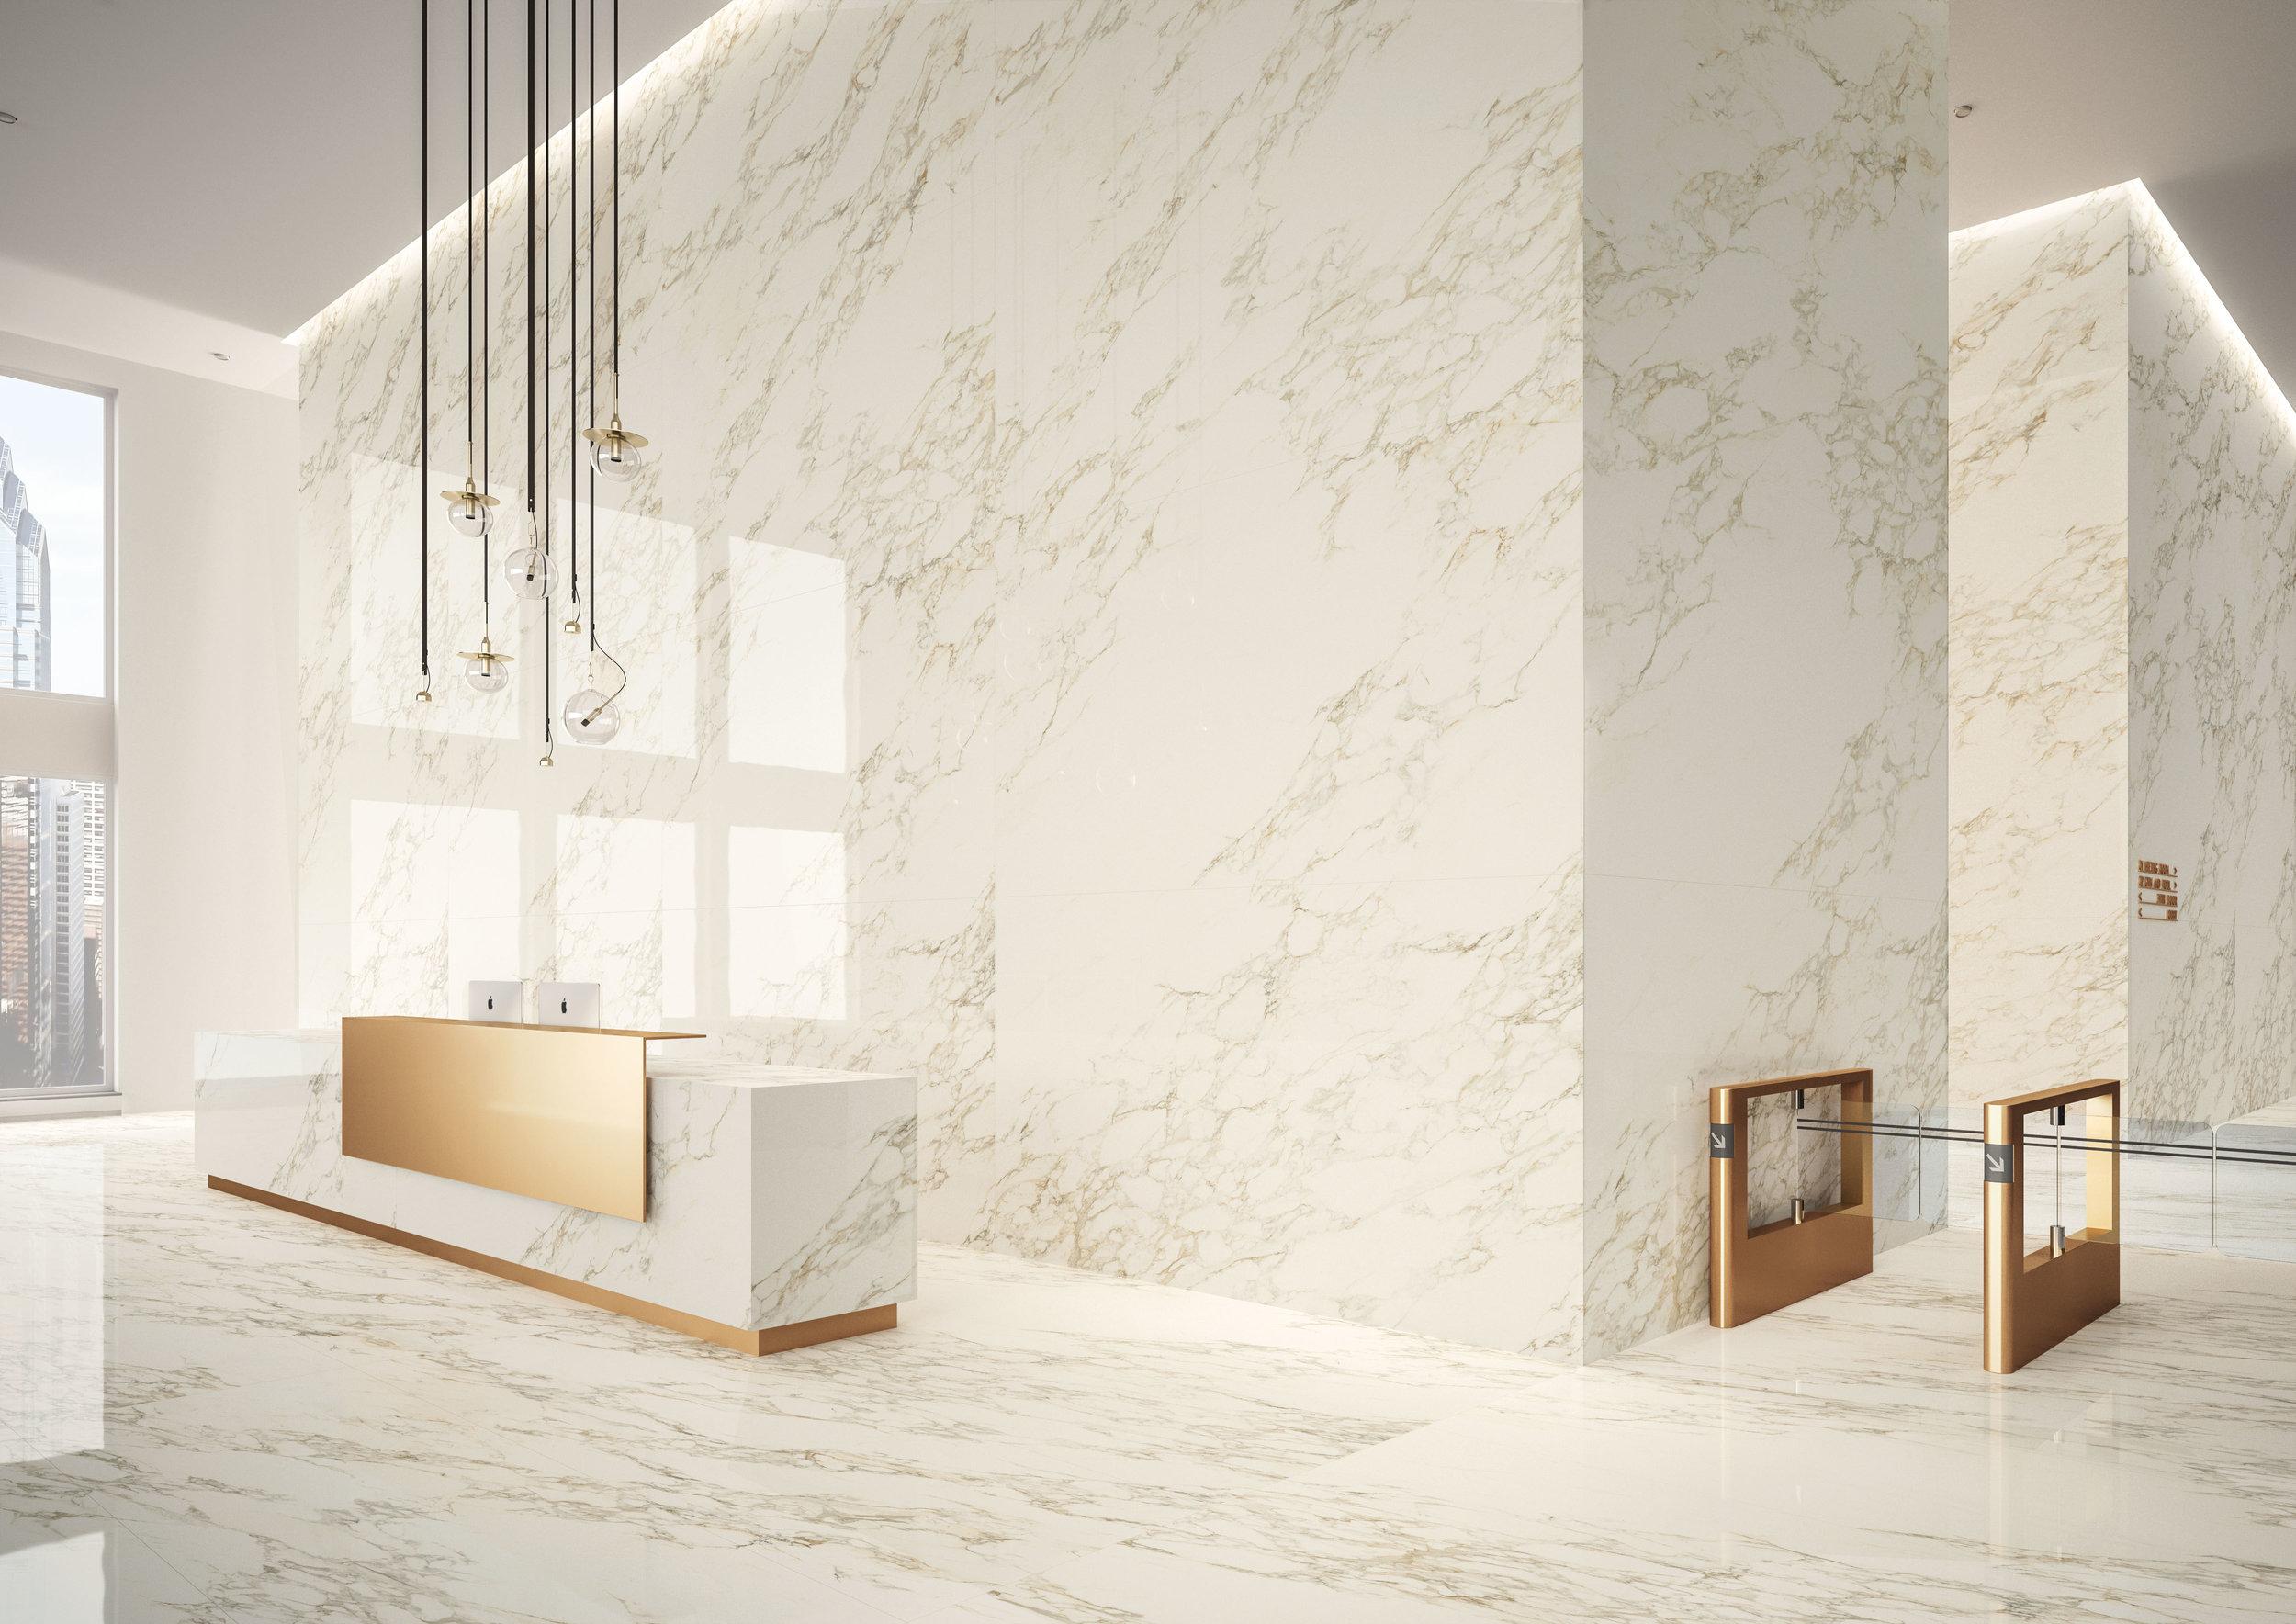 acquastone_Italgraniti_Marble Experience_01_Commerciale_Definitivo 01.jpg*.jpg